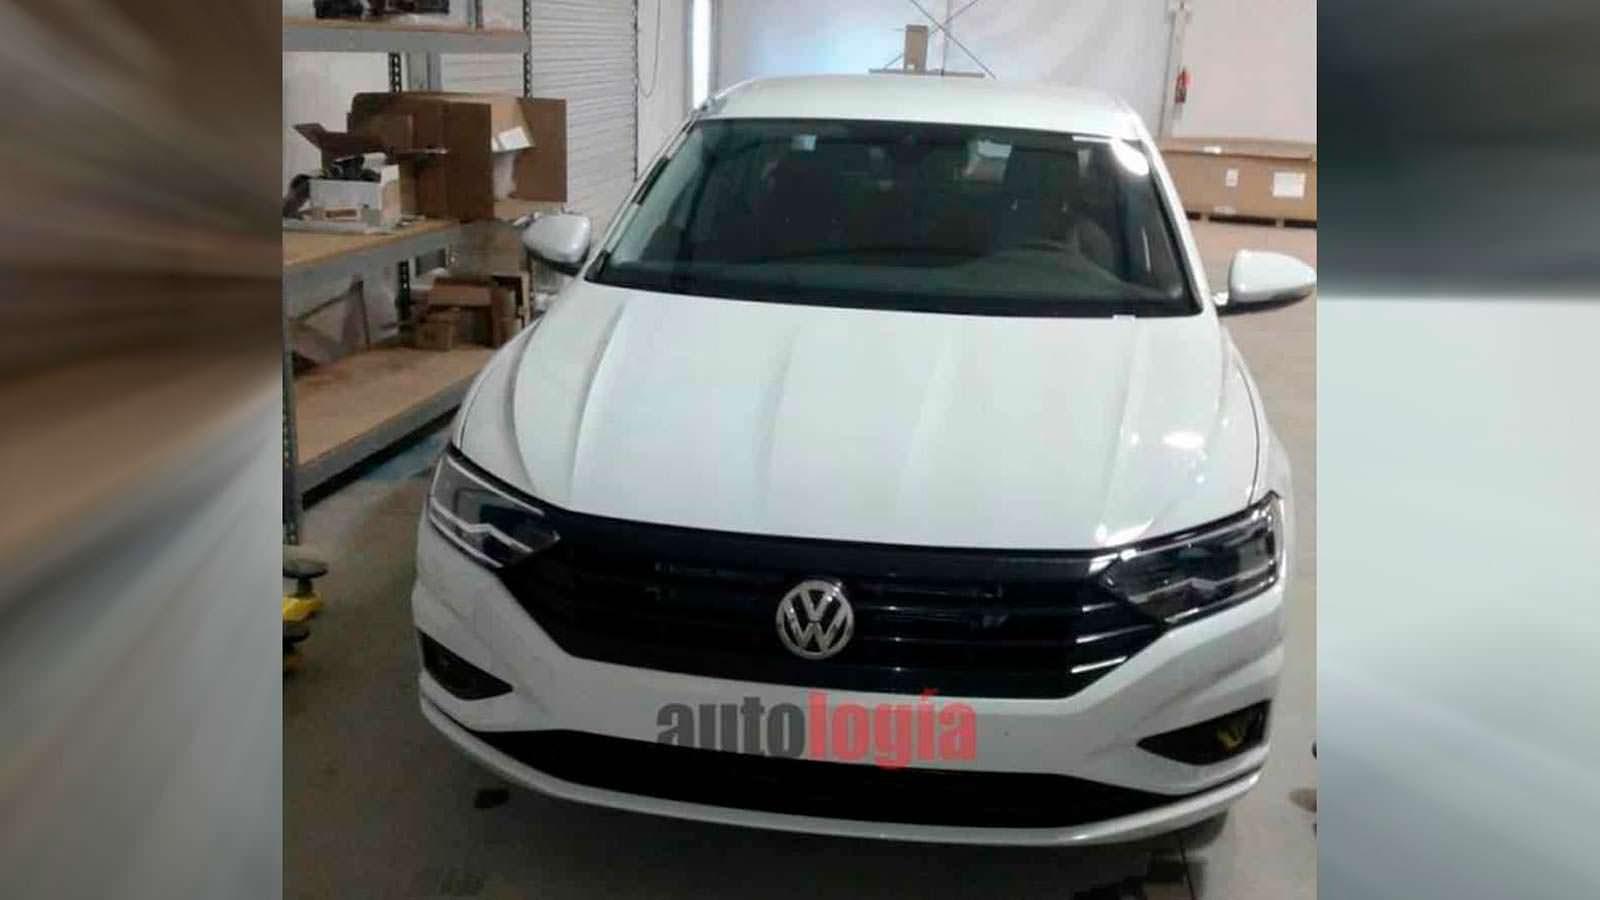 Шпионские фото Volkswagen Jetta VII без маскировки